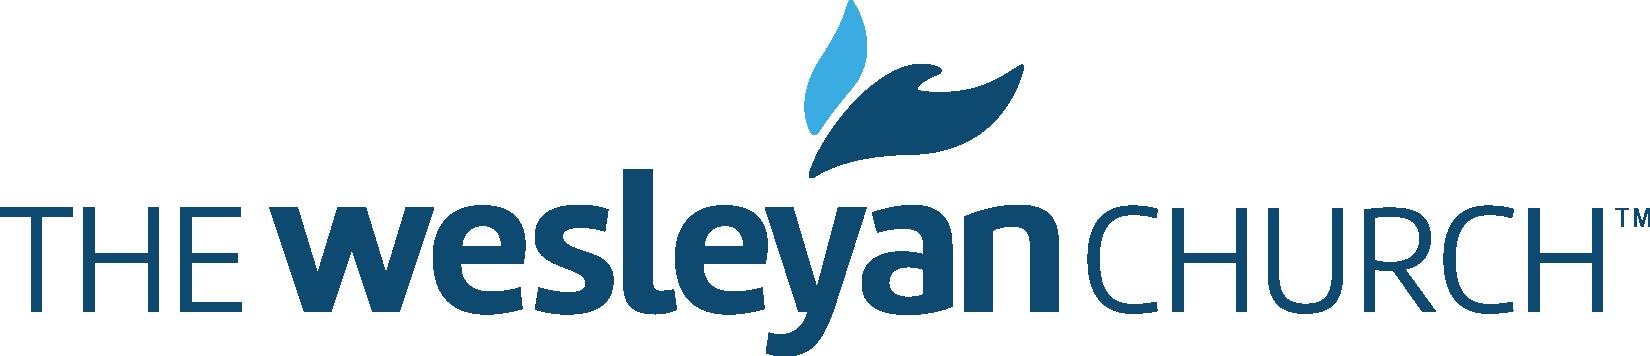 logo for Wesleyan Church Headquarters